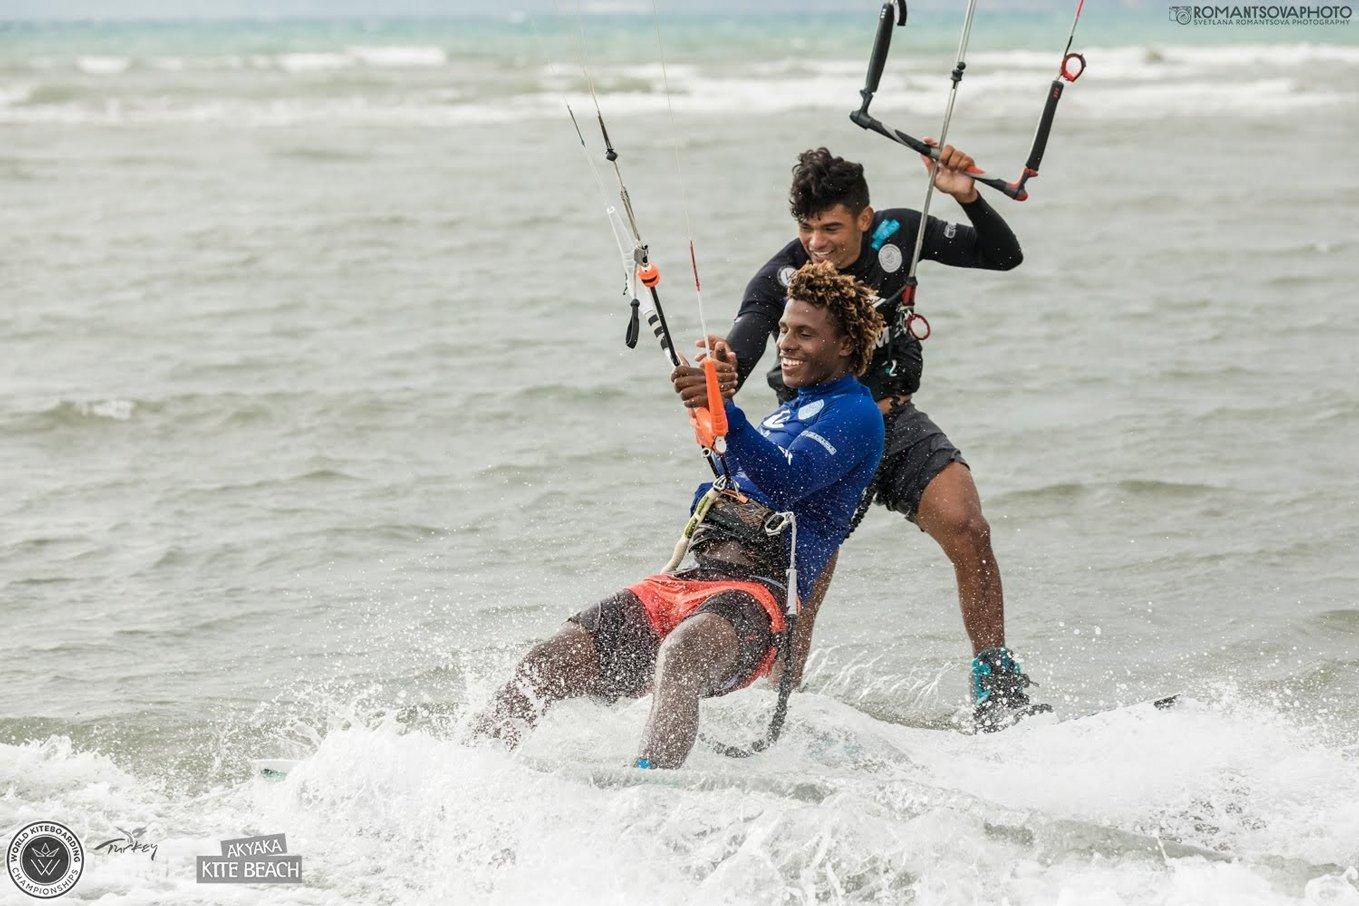 competition kitesurf-Carlos Mario-Corniel